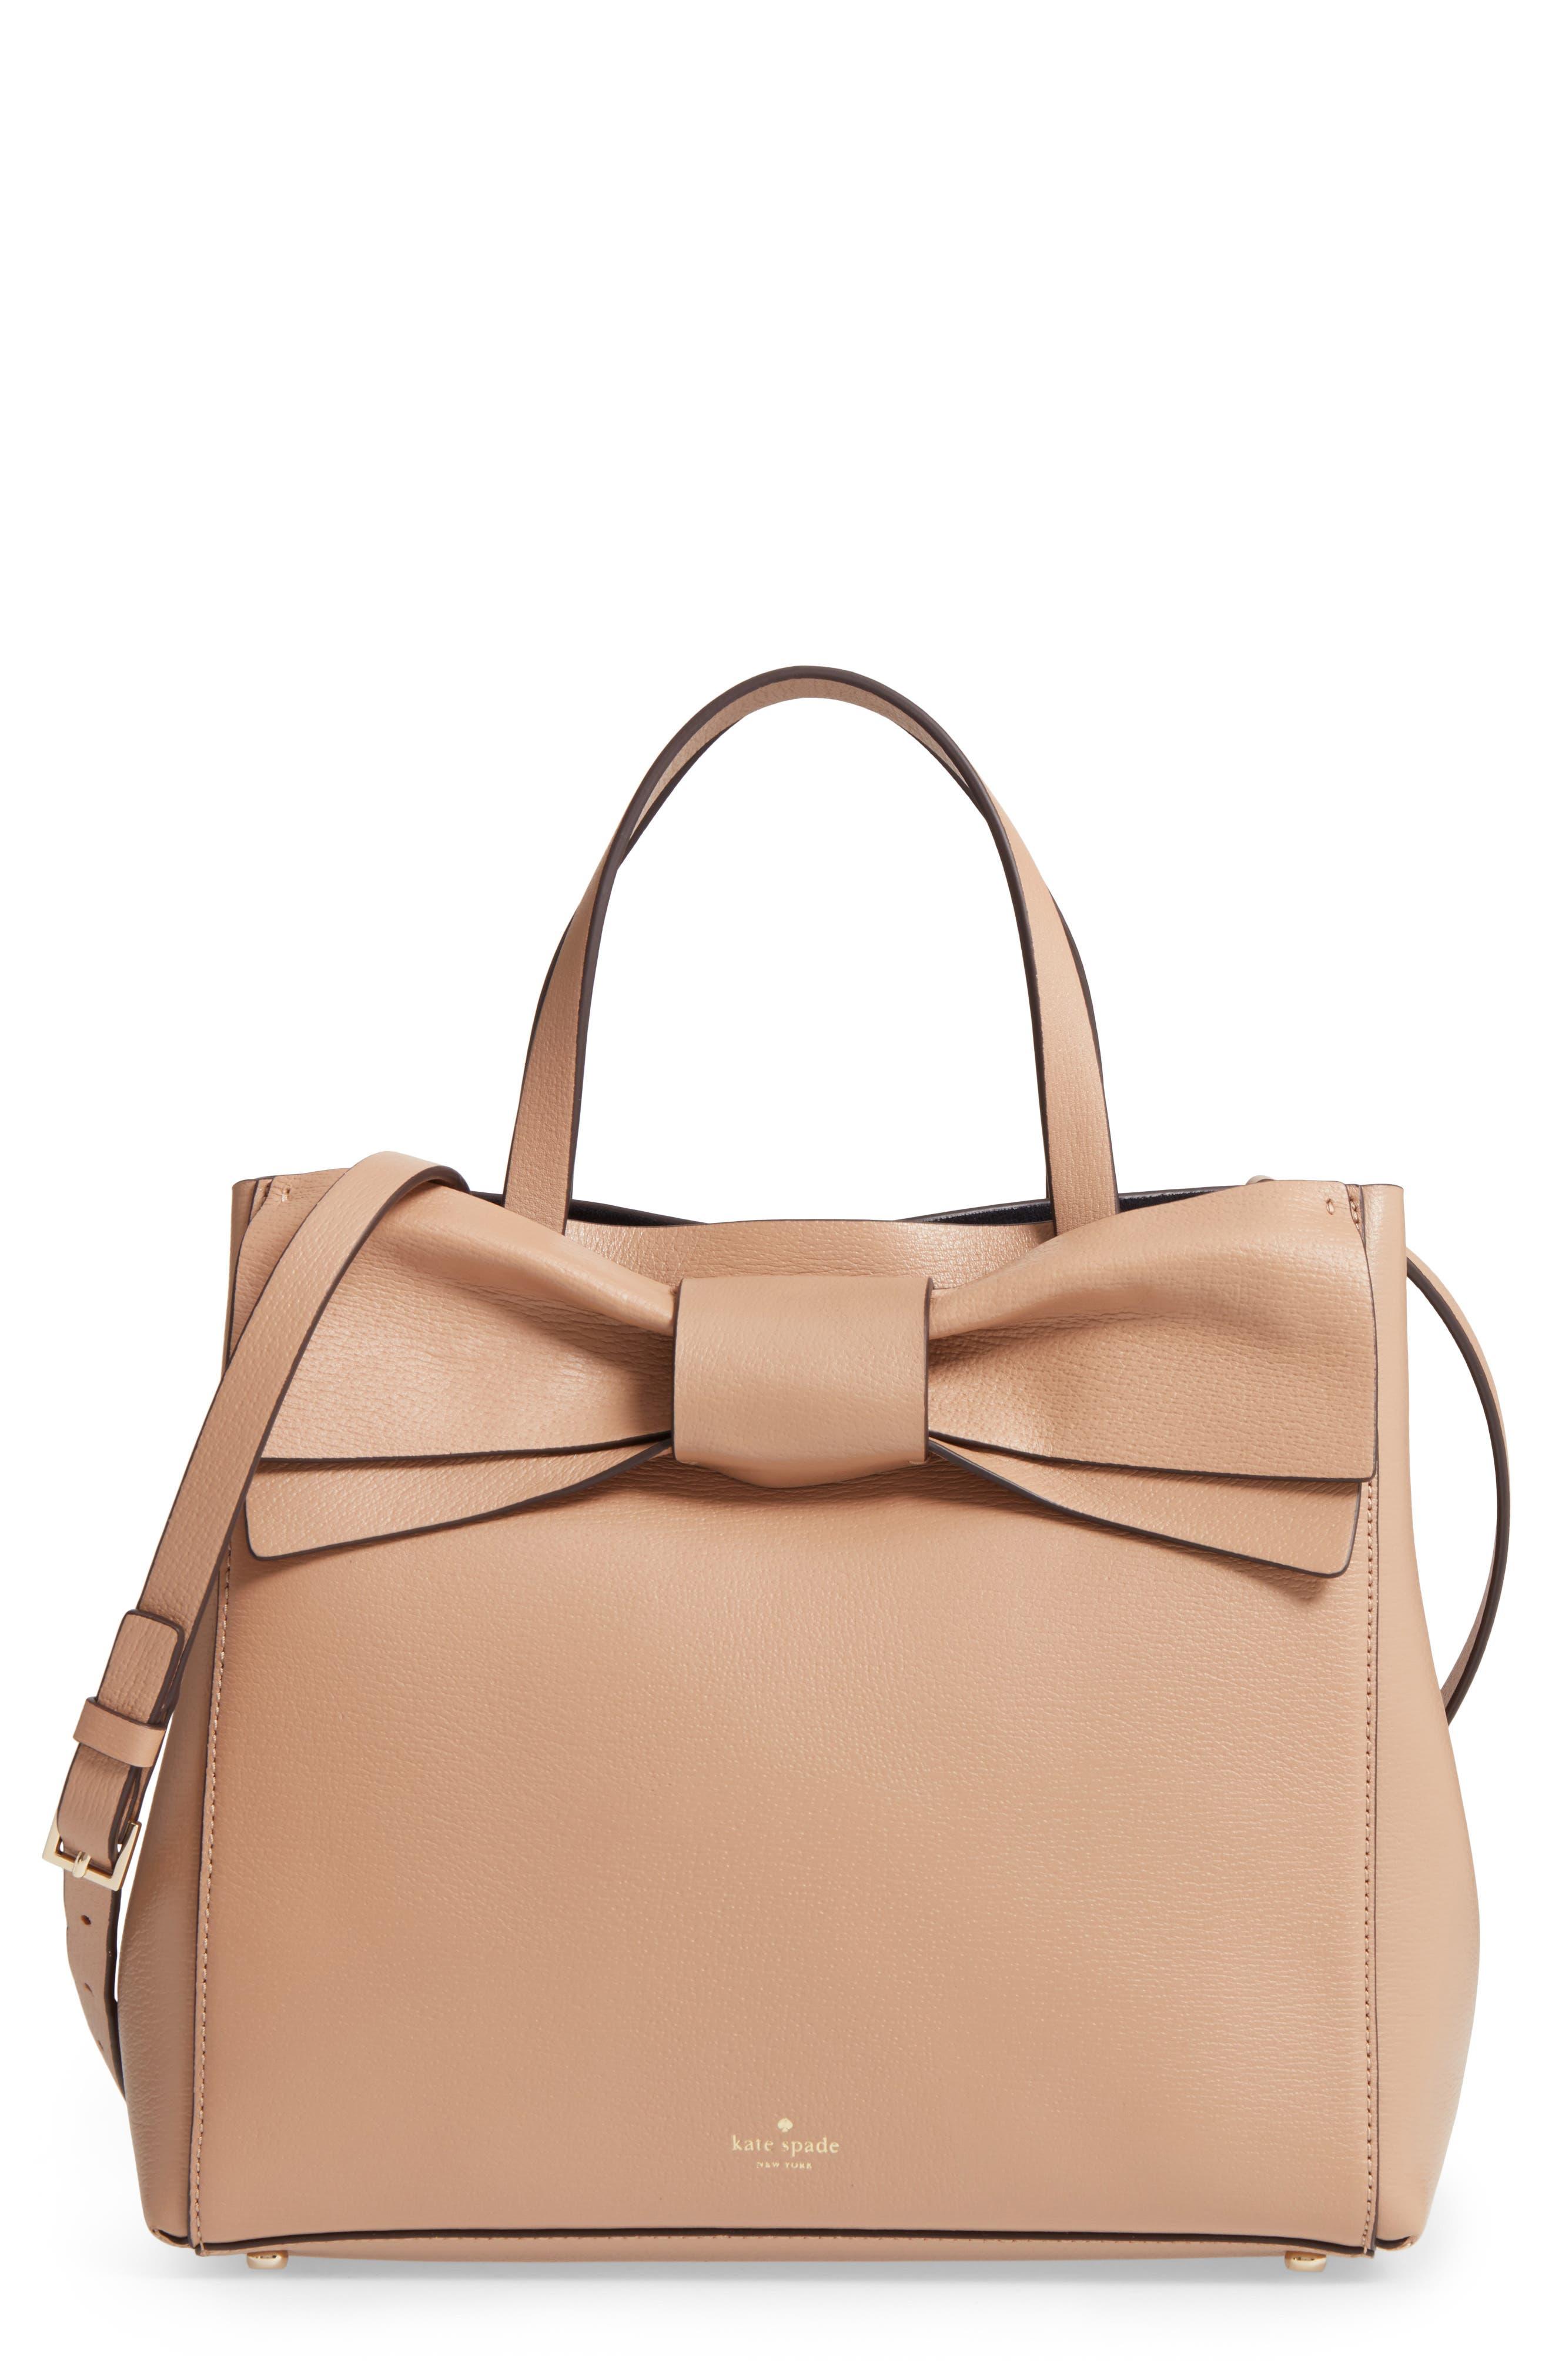 kate spade new york olive drive - brigette leather satchel